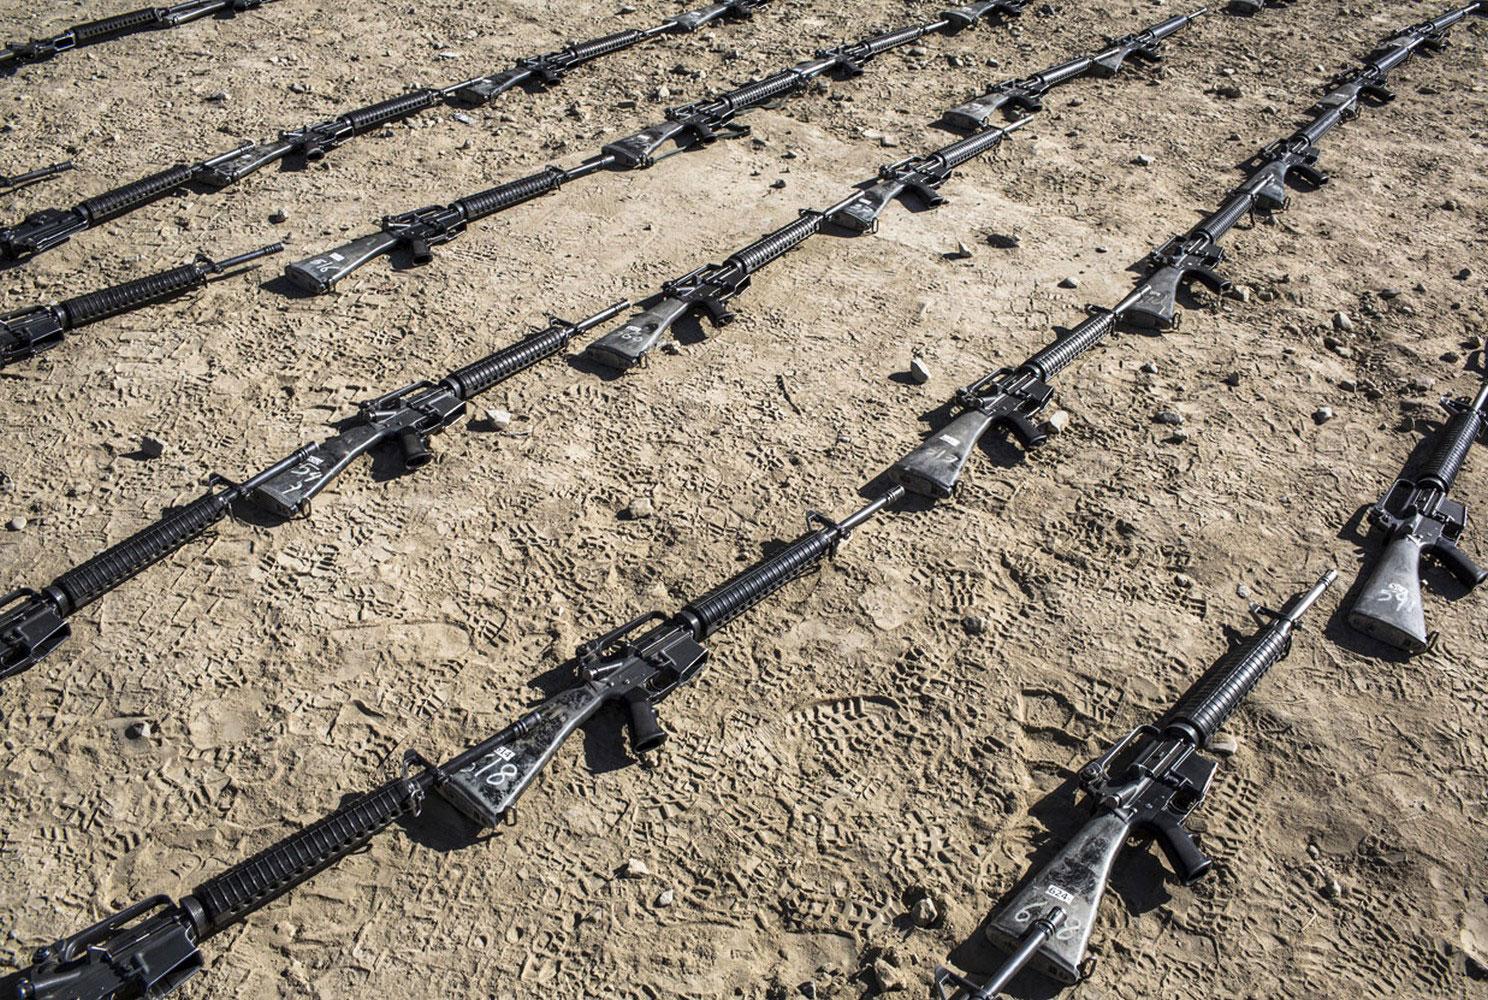 Американские автоматические винтовки М-16